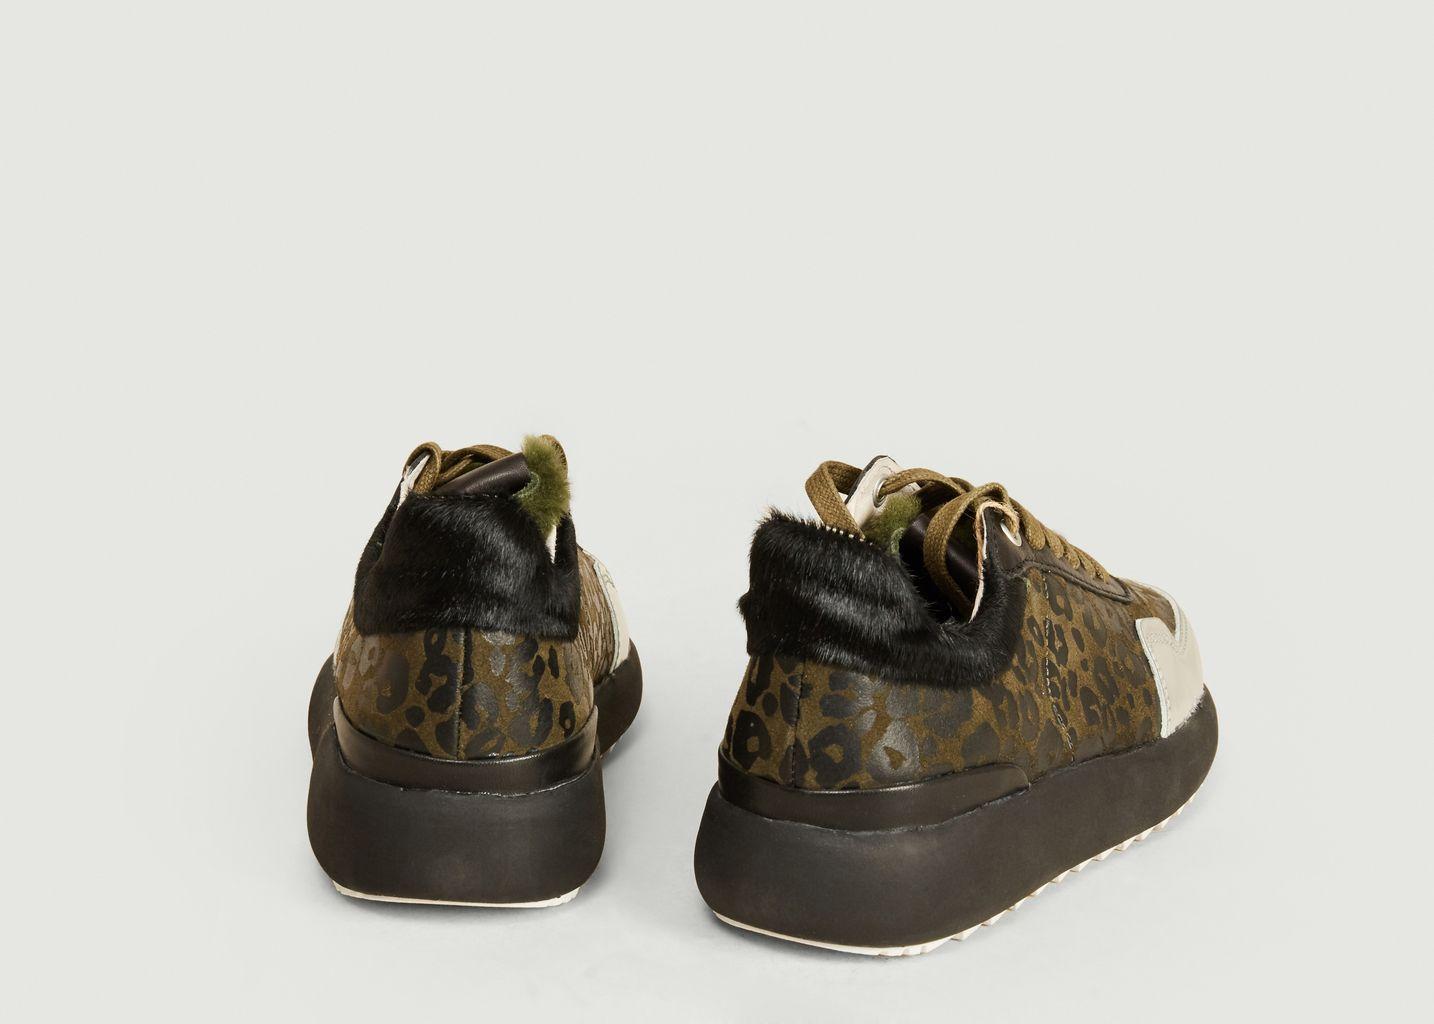 Sneakers de running motif léopard SL91 - Blackstone